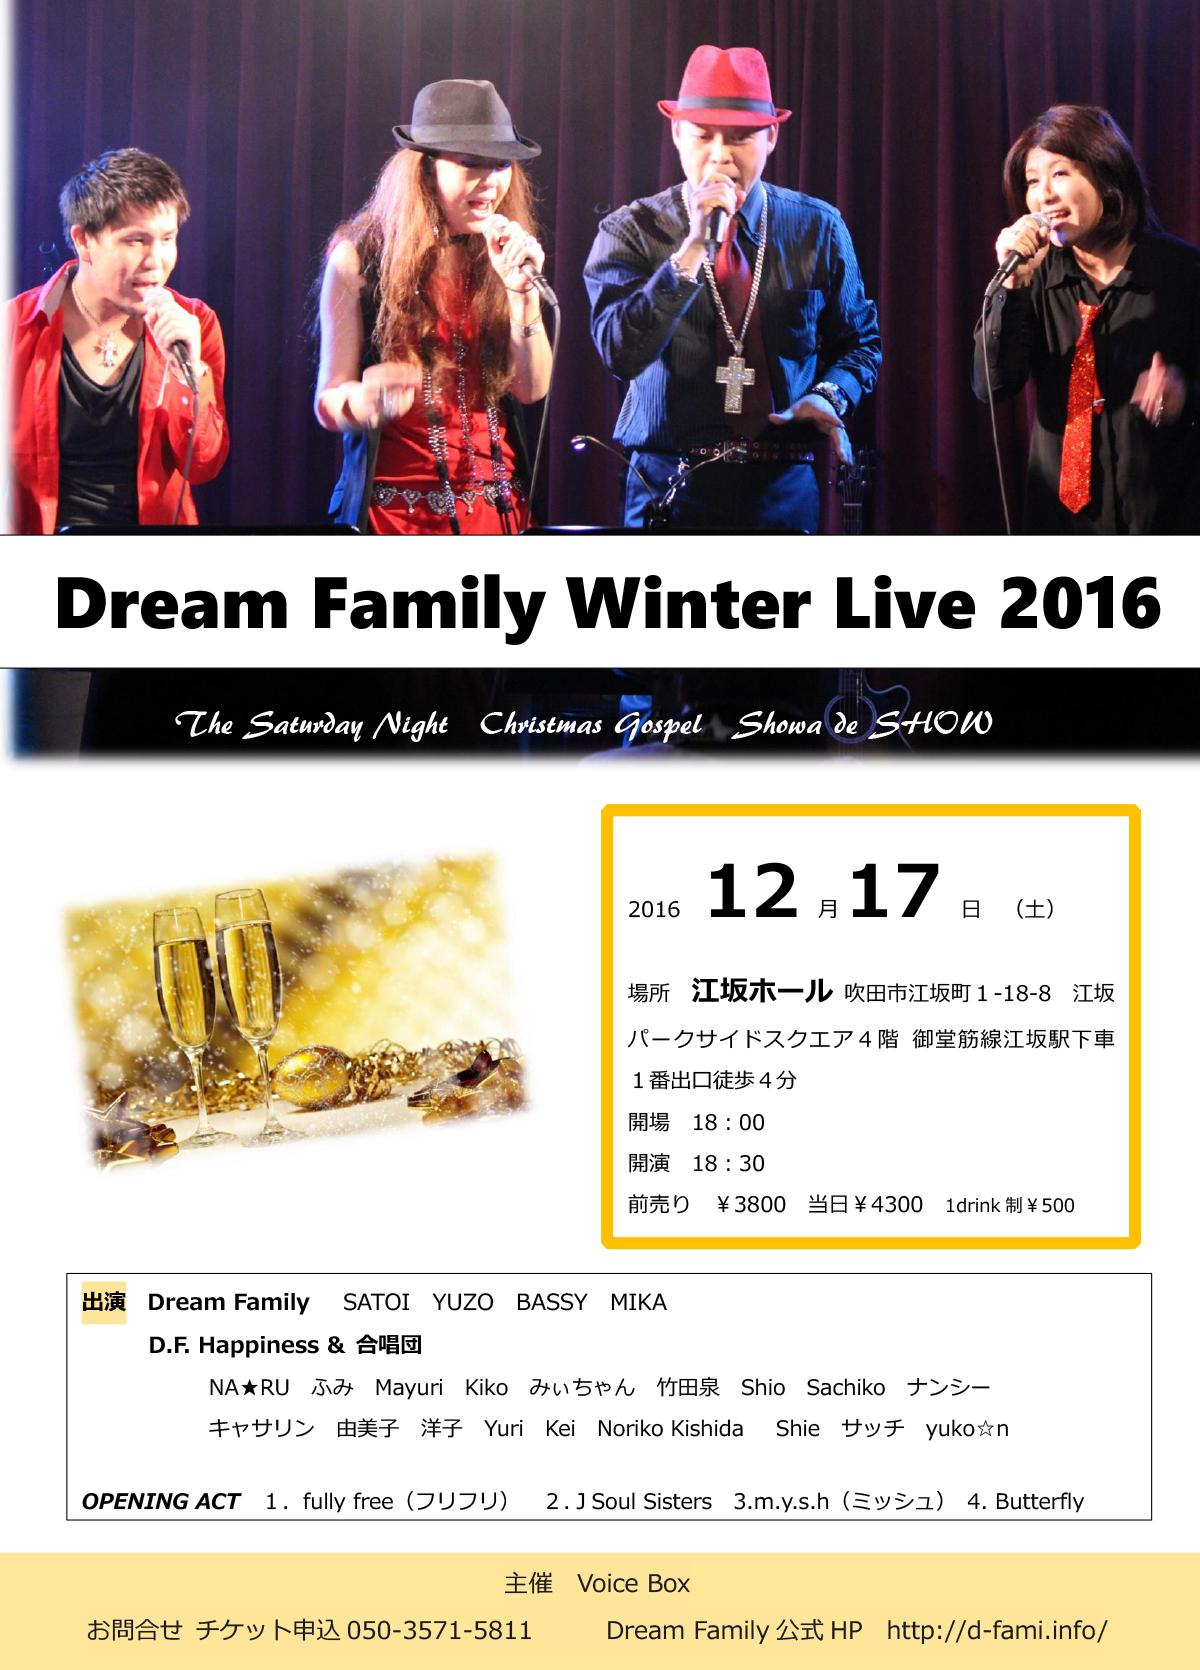 Dream family winter live 2016